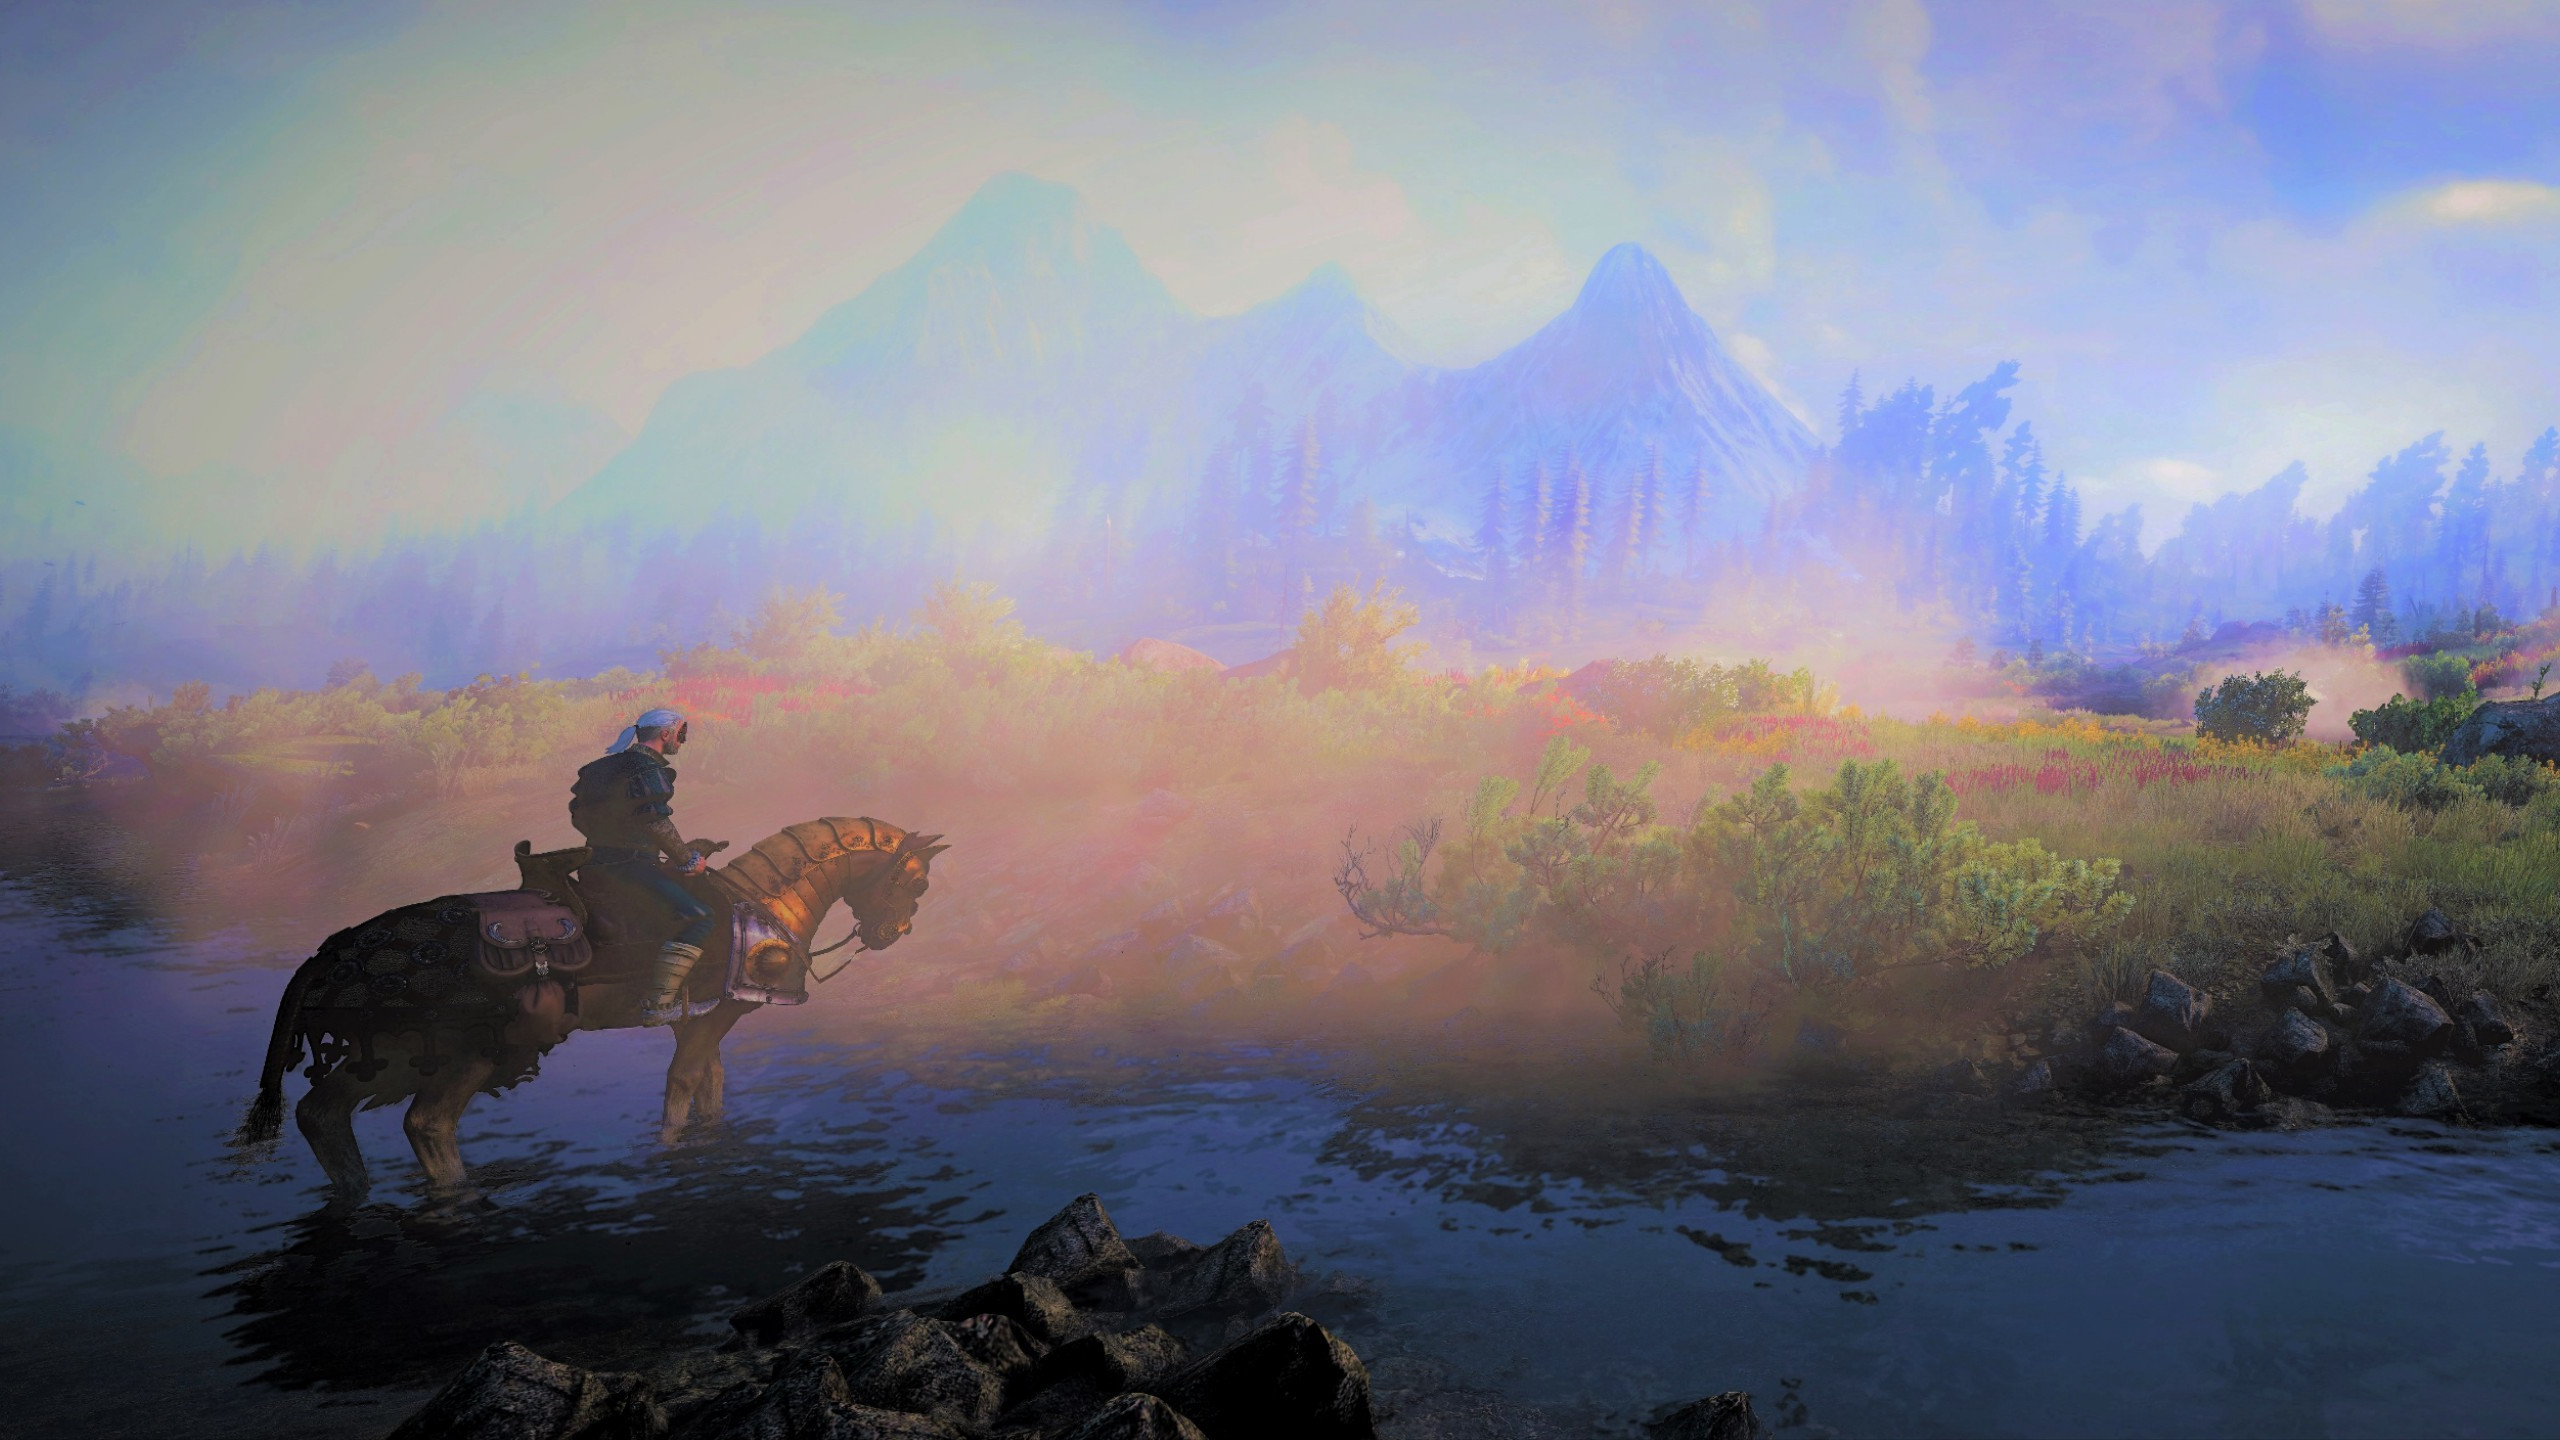 Download 2560x1440 Wallpaper The Witcher 3 Wild Hunt Video